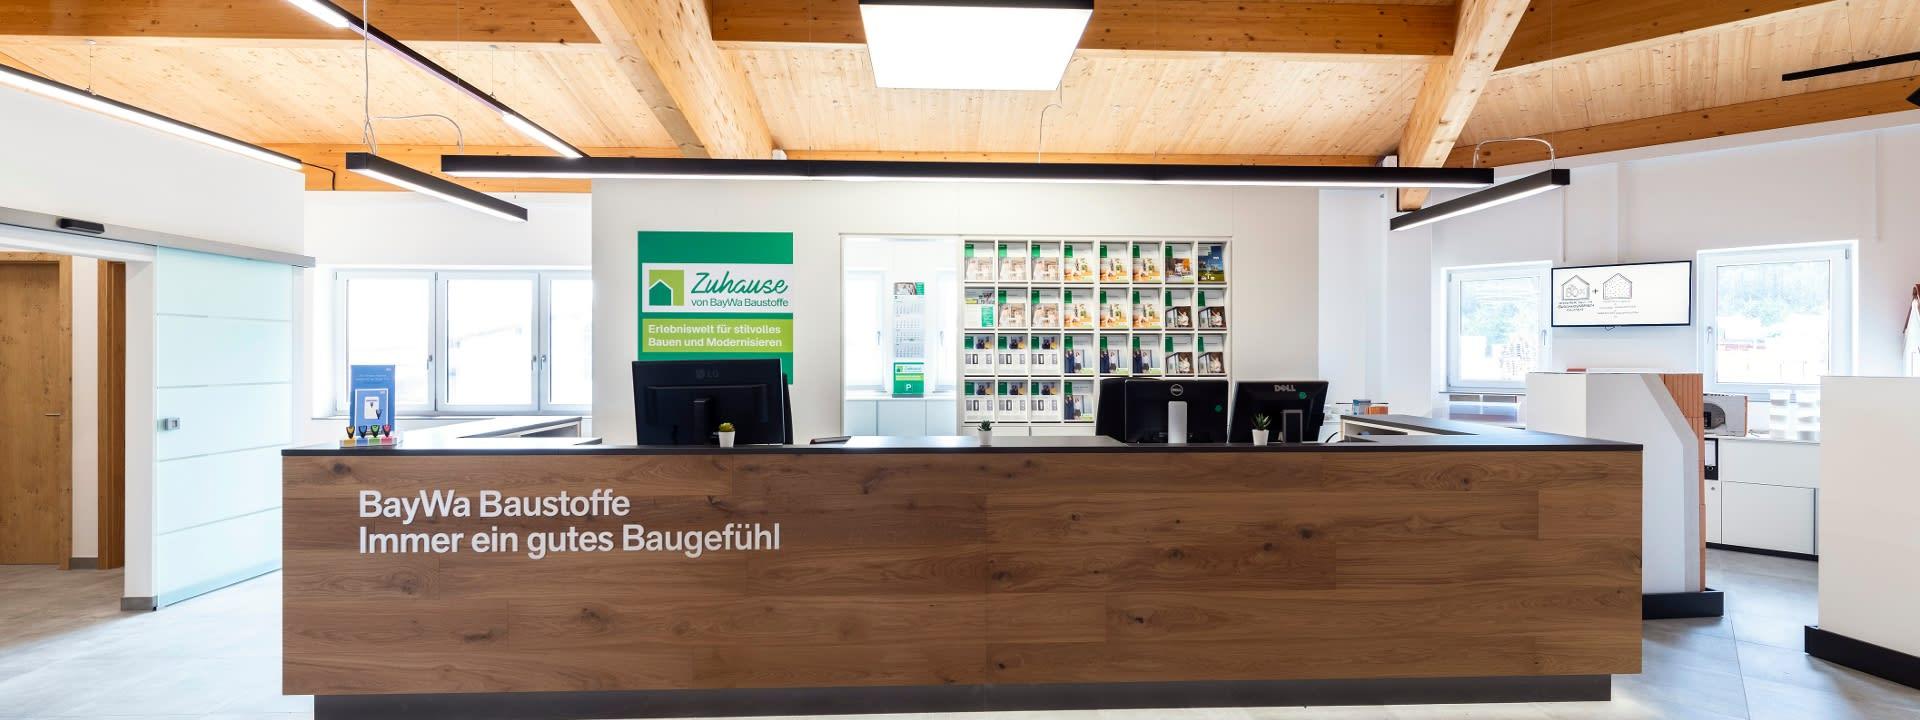 BayWa Baustoffe Babenhausen